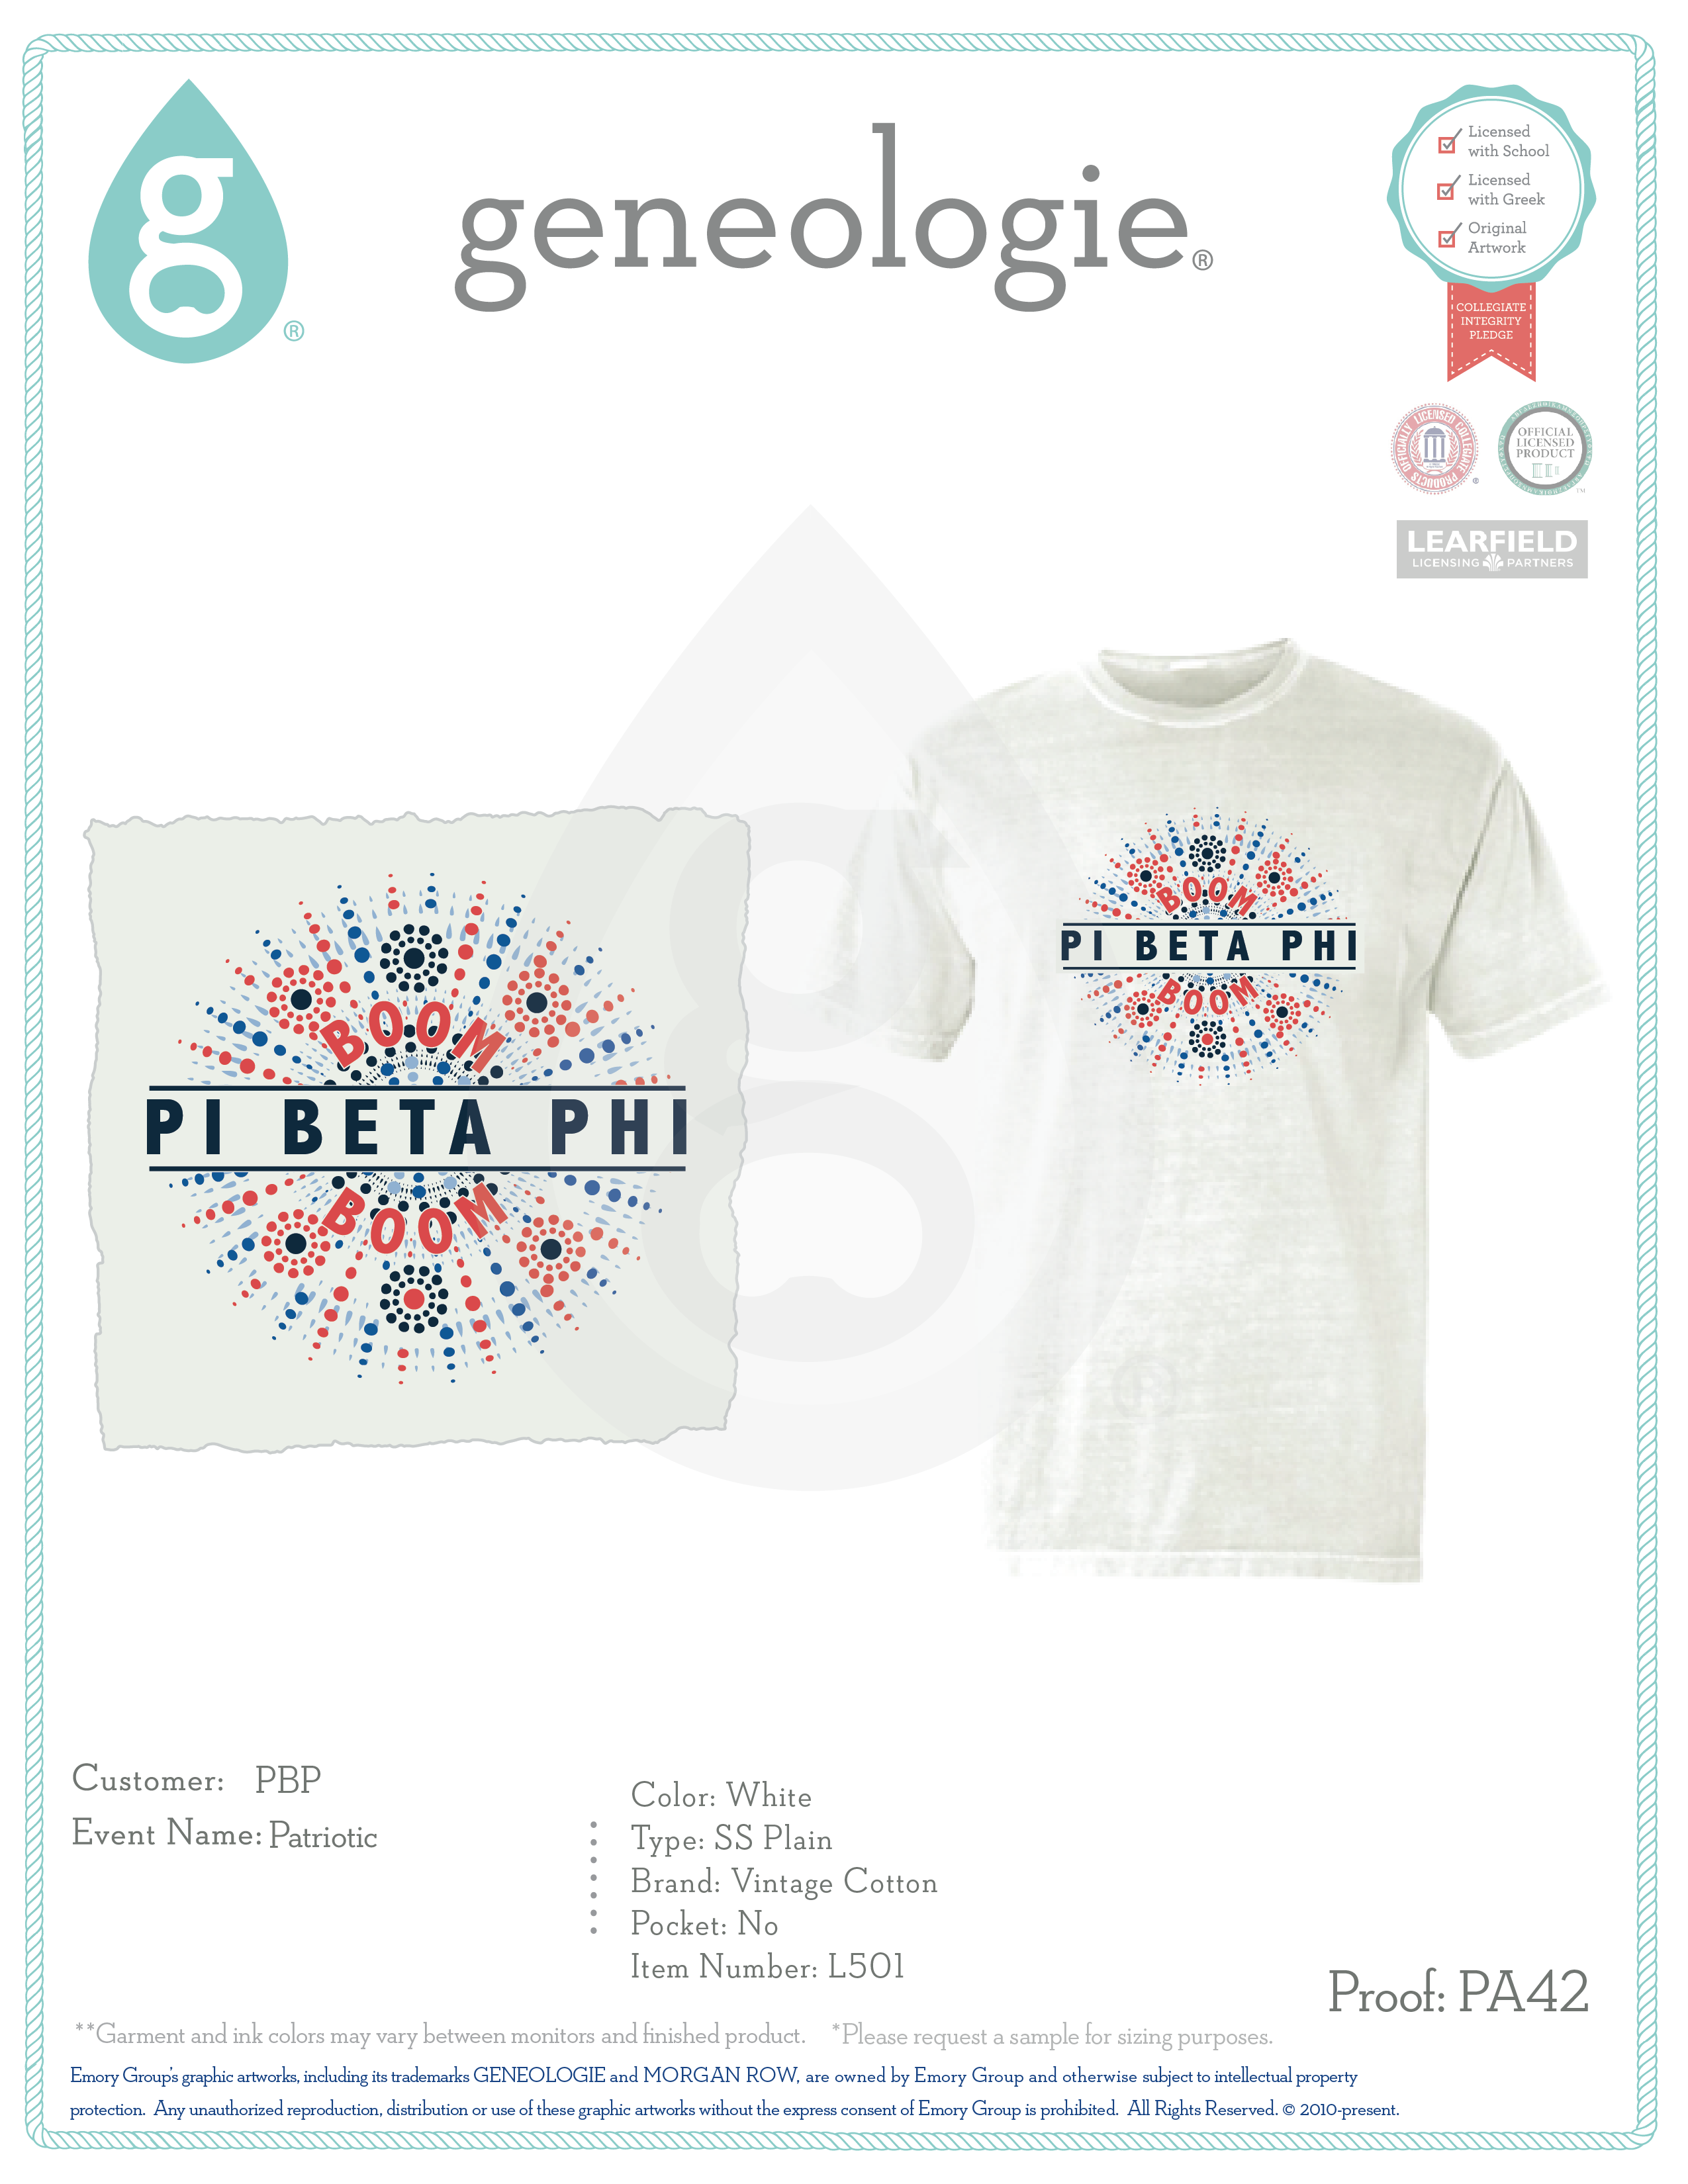 Shirt design sample - Geneologie Greek Tee Shirts Greek Tanks Custom Apparel Design Custom Greek Apparel